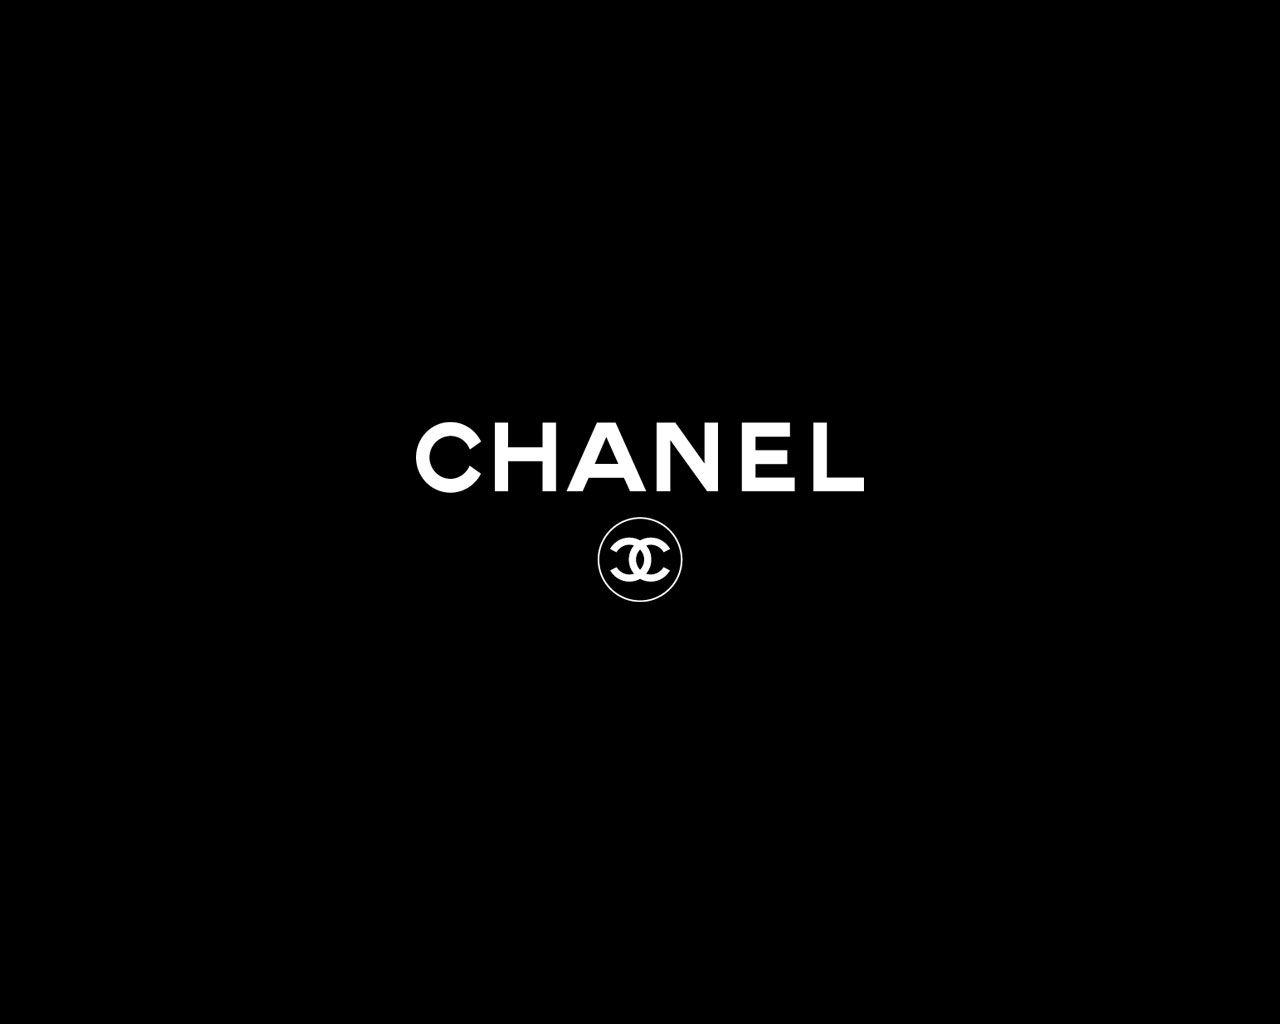 Chanel Logo Wallpaper Chanel Wallpapers Computer Wallpaper Macbook Wallpaper